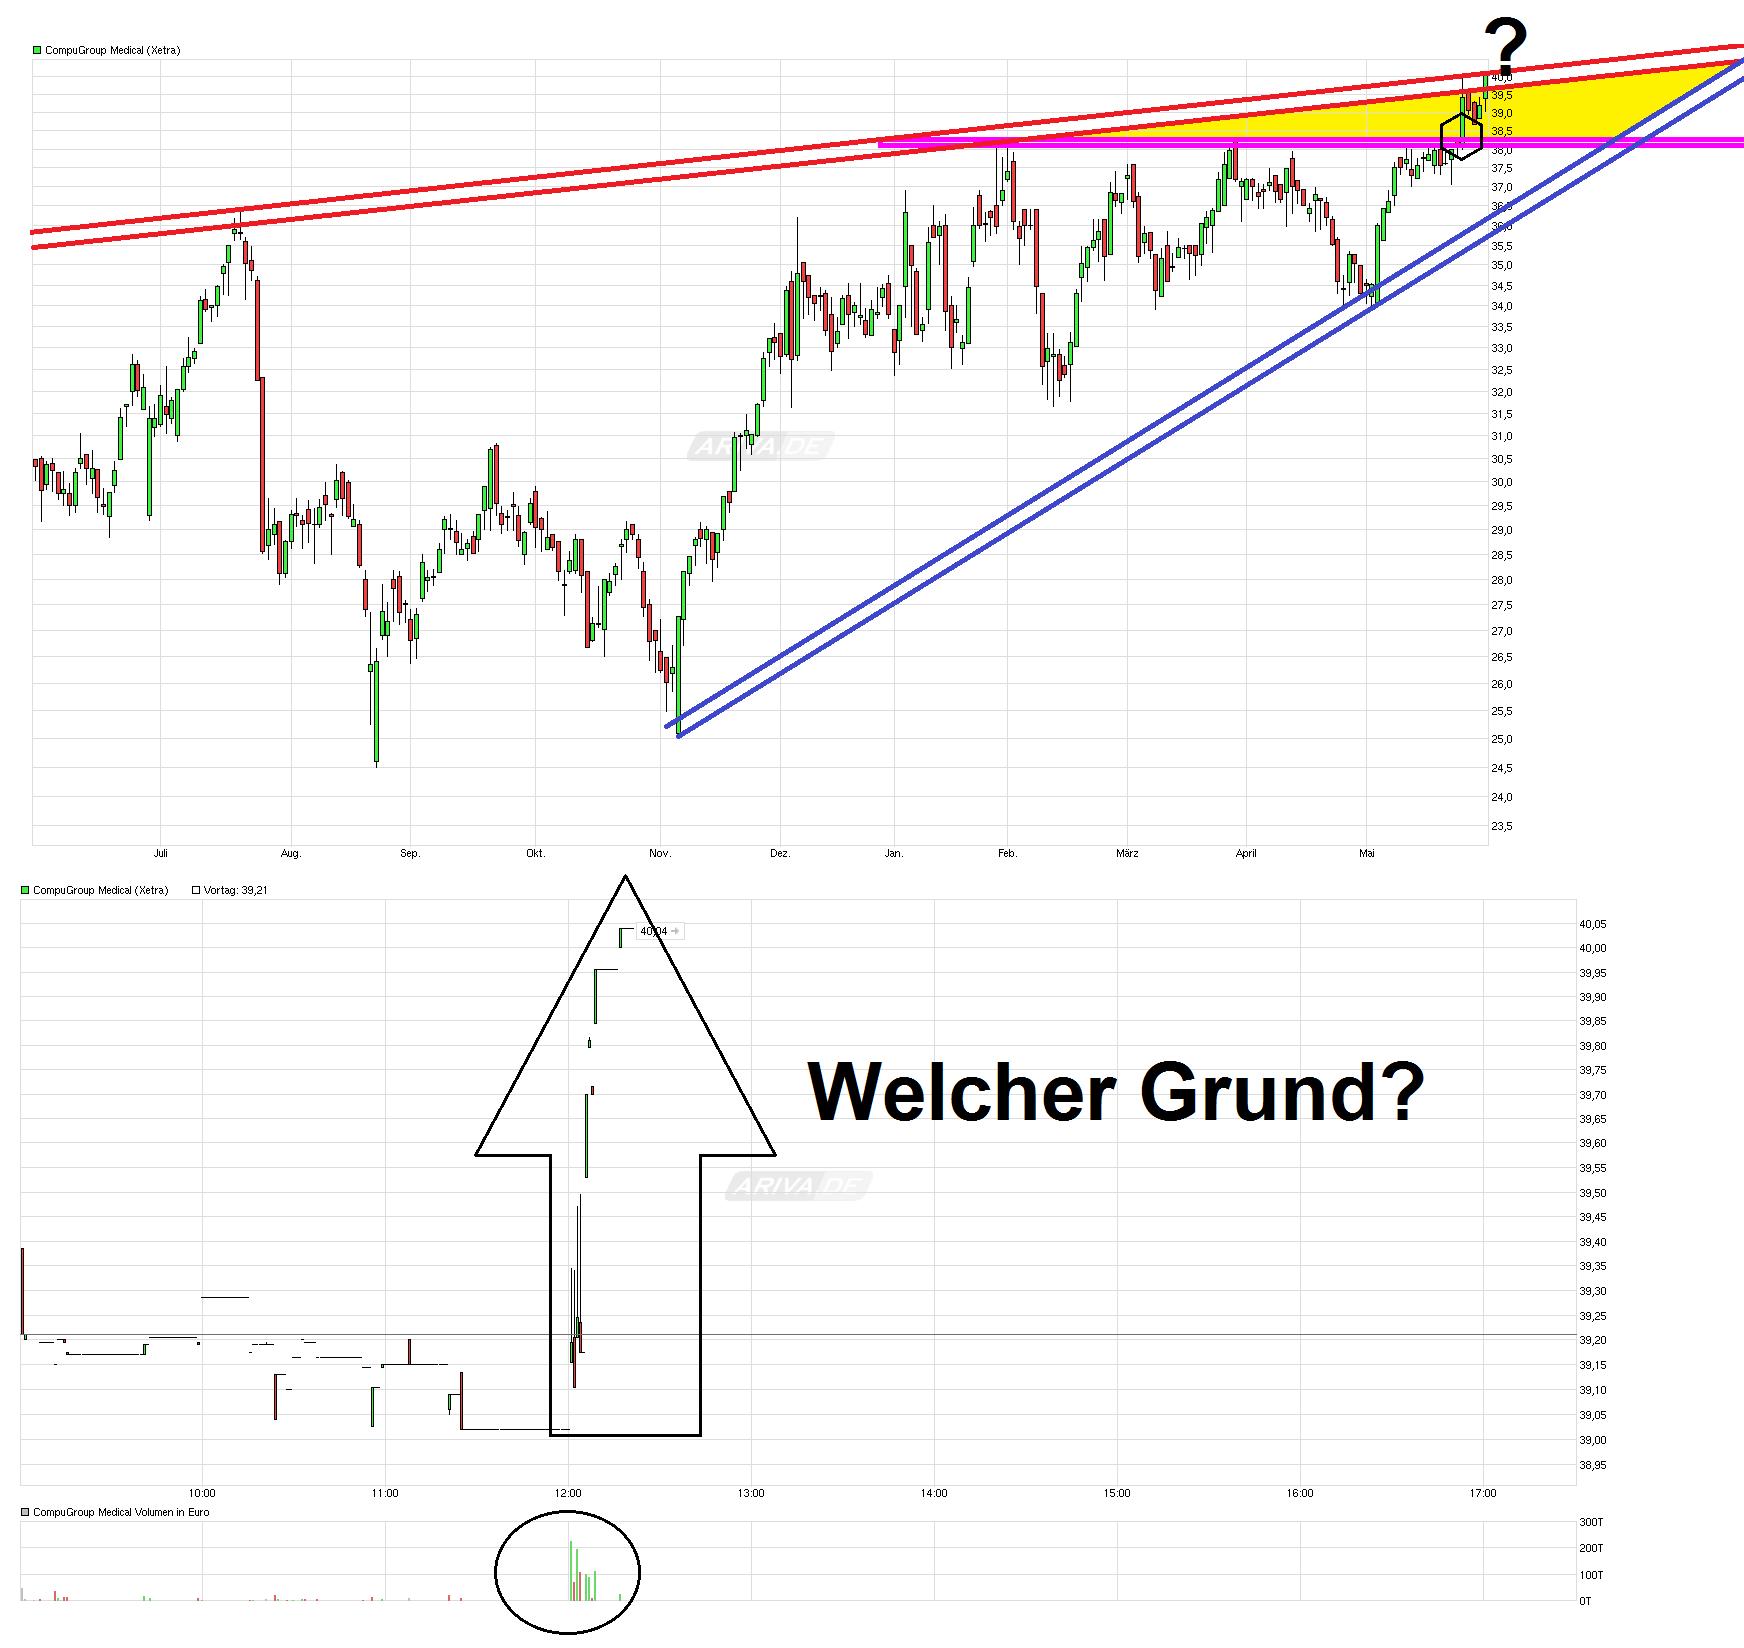 chart_year_compugroupmedical.png